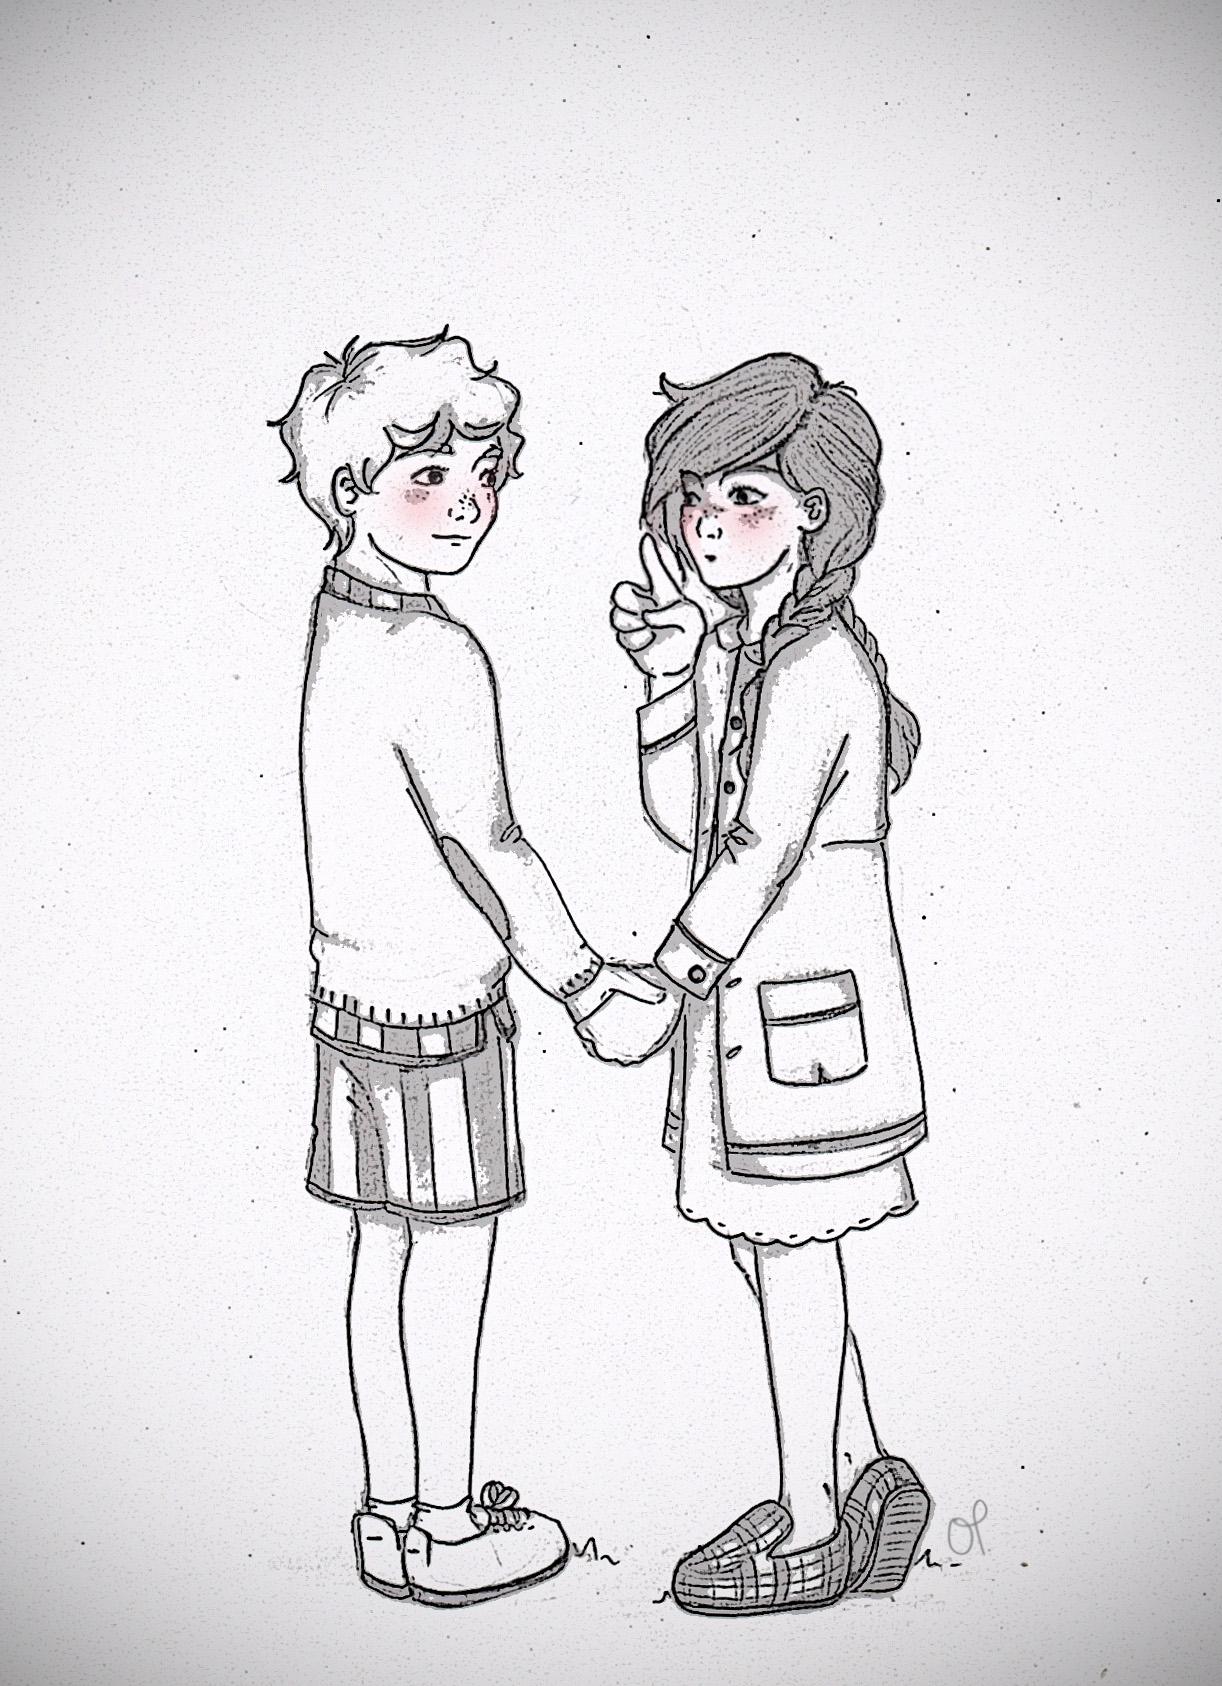 1222x1686 Boy And Girl Sketch Tumblr Boy And Girl Sketch Tumblr Drawing